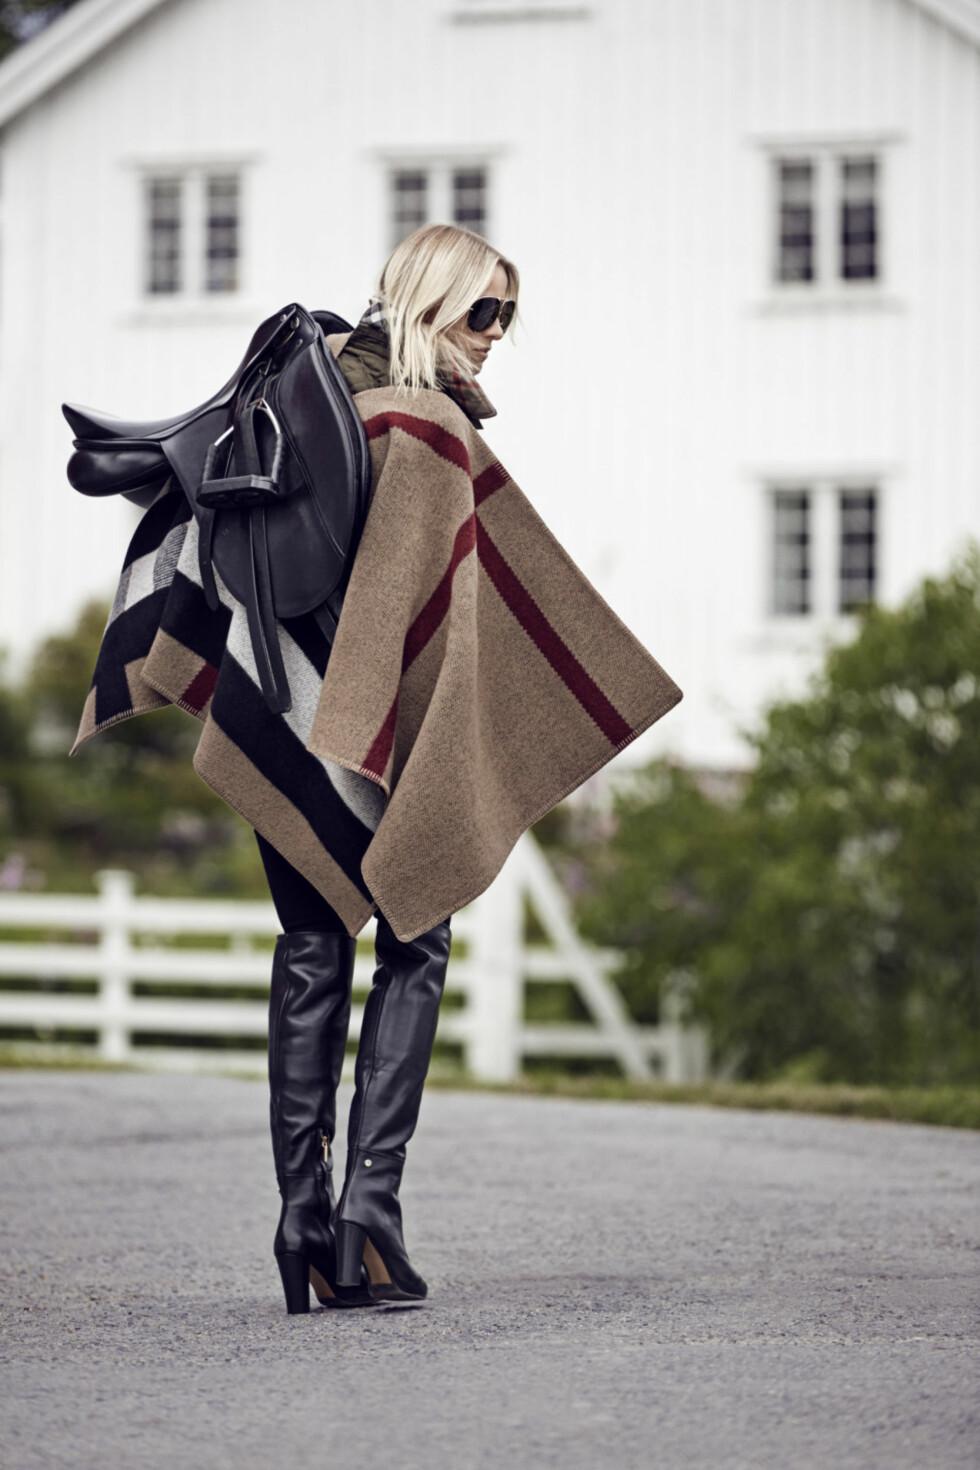 Profilert moteblogger i ny kampanje: Aagaard i trendy poncho. Denne varianten fra Burberry kan du få med dine initianaler.  Foto: Truls Qvale/Burberry